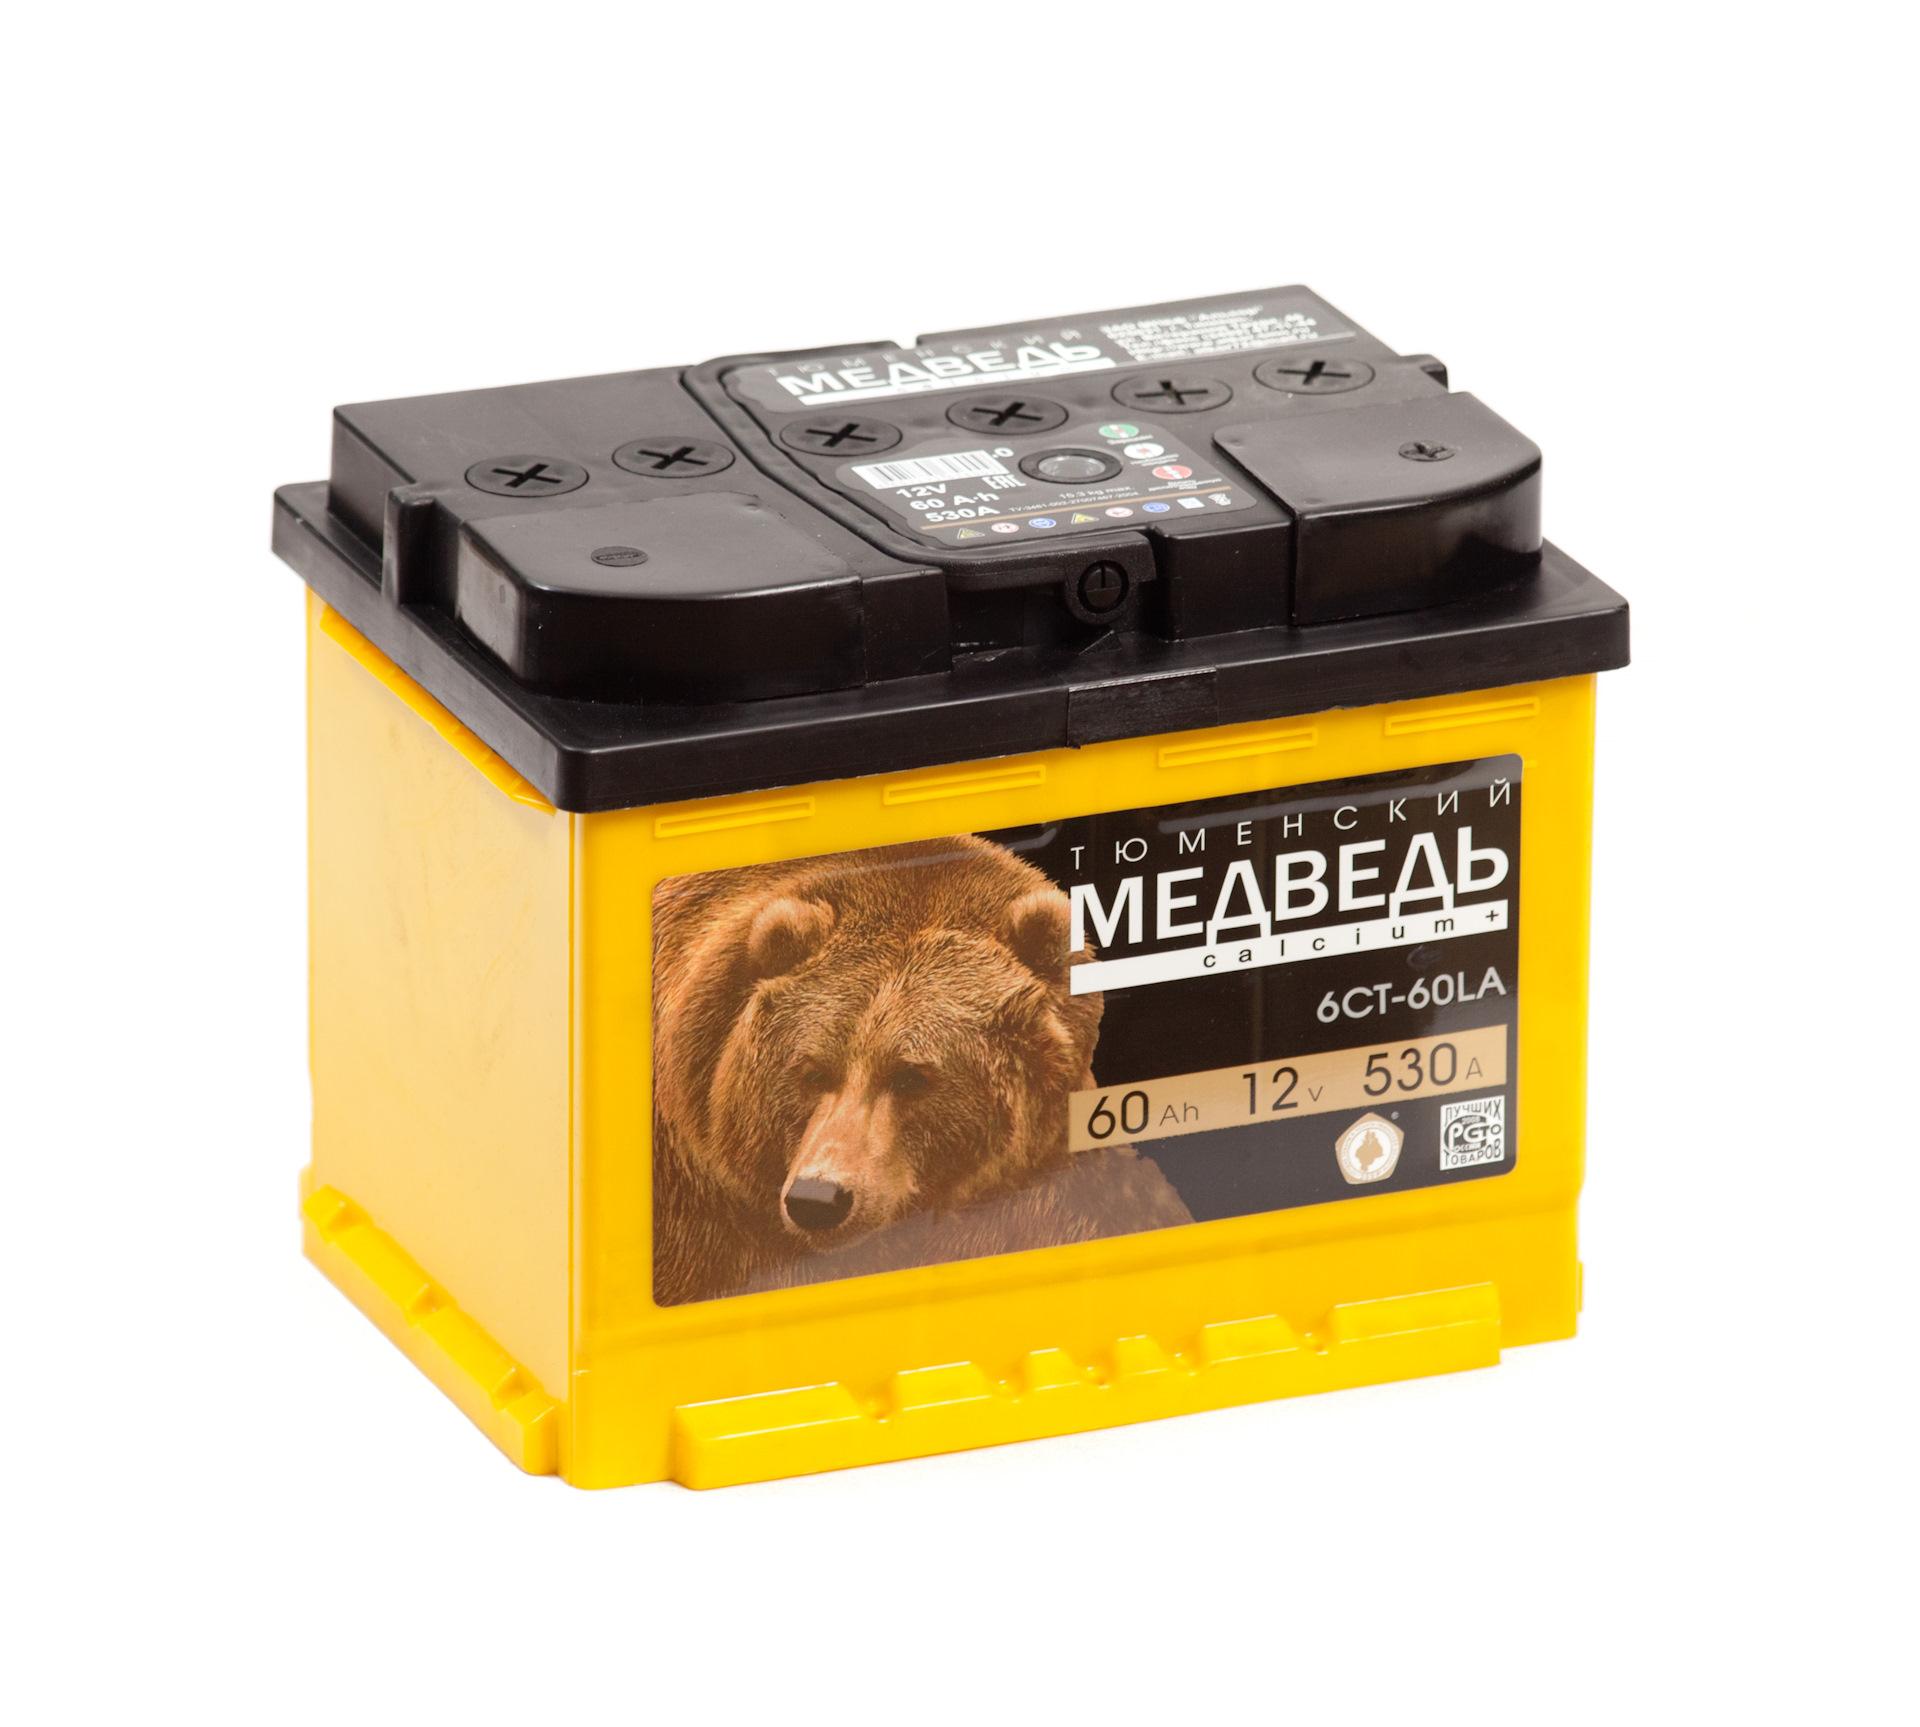 Аккумулятор Тюменский медведь 60А, L+